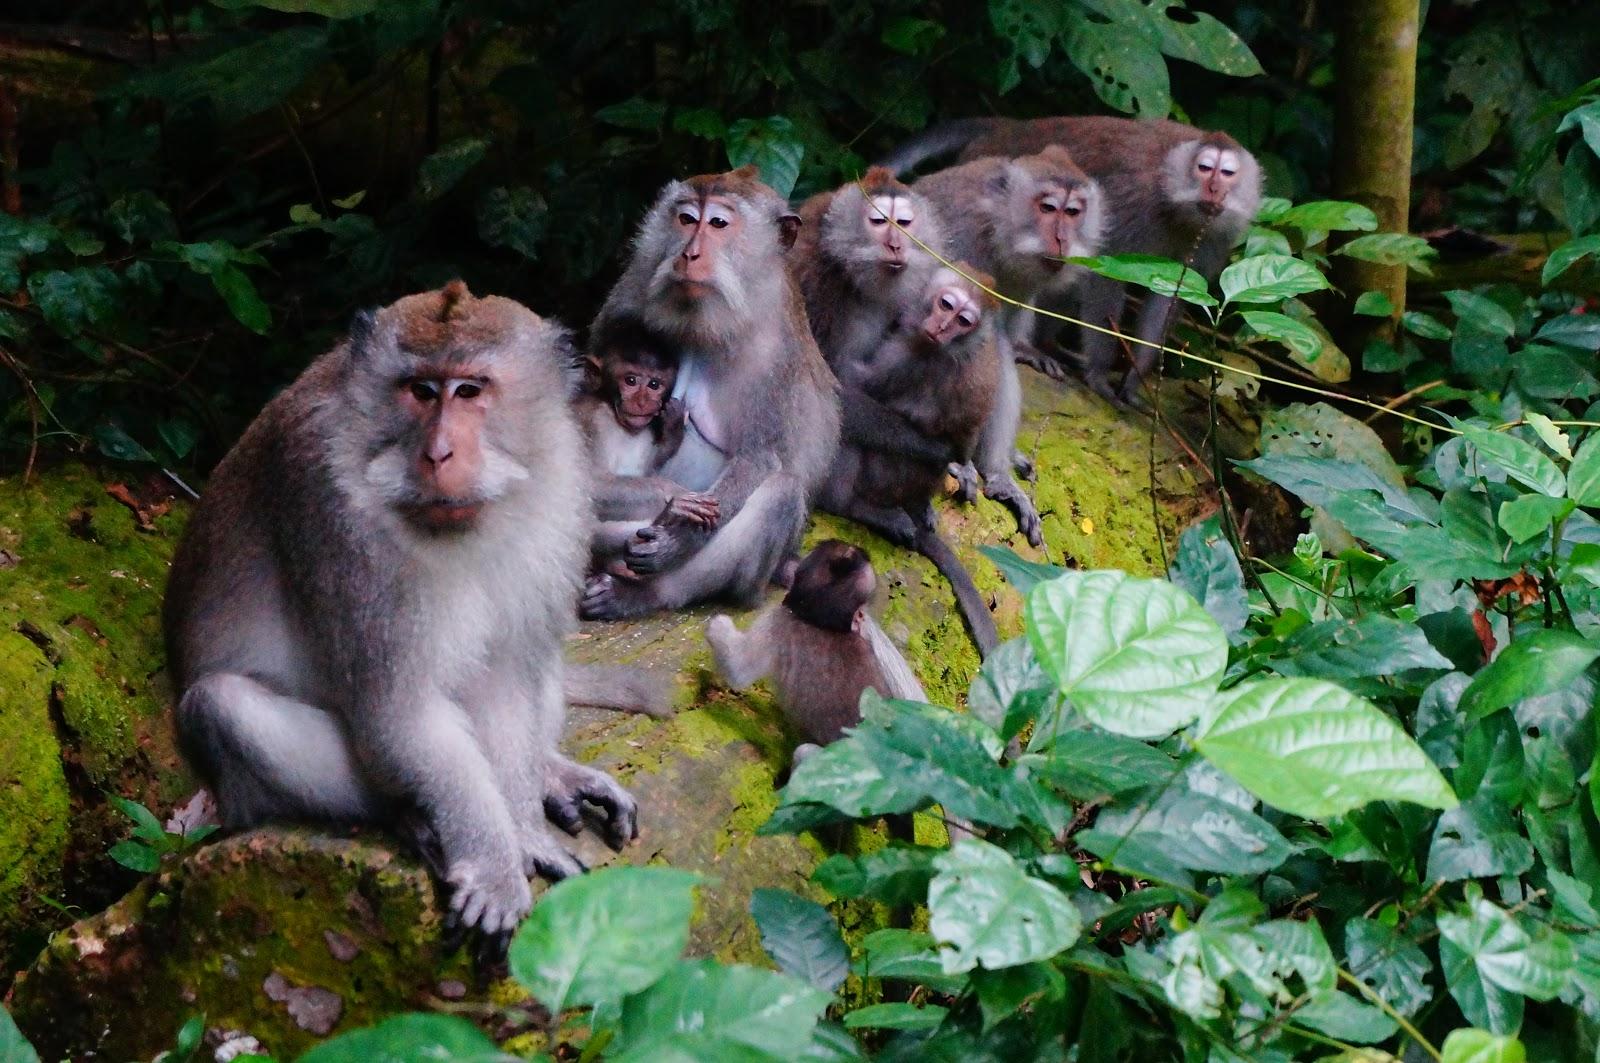 Monyet-Monyet di Hutan Suranadi (Sumber: ziadahsjournal.blogspot.com)